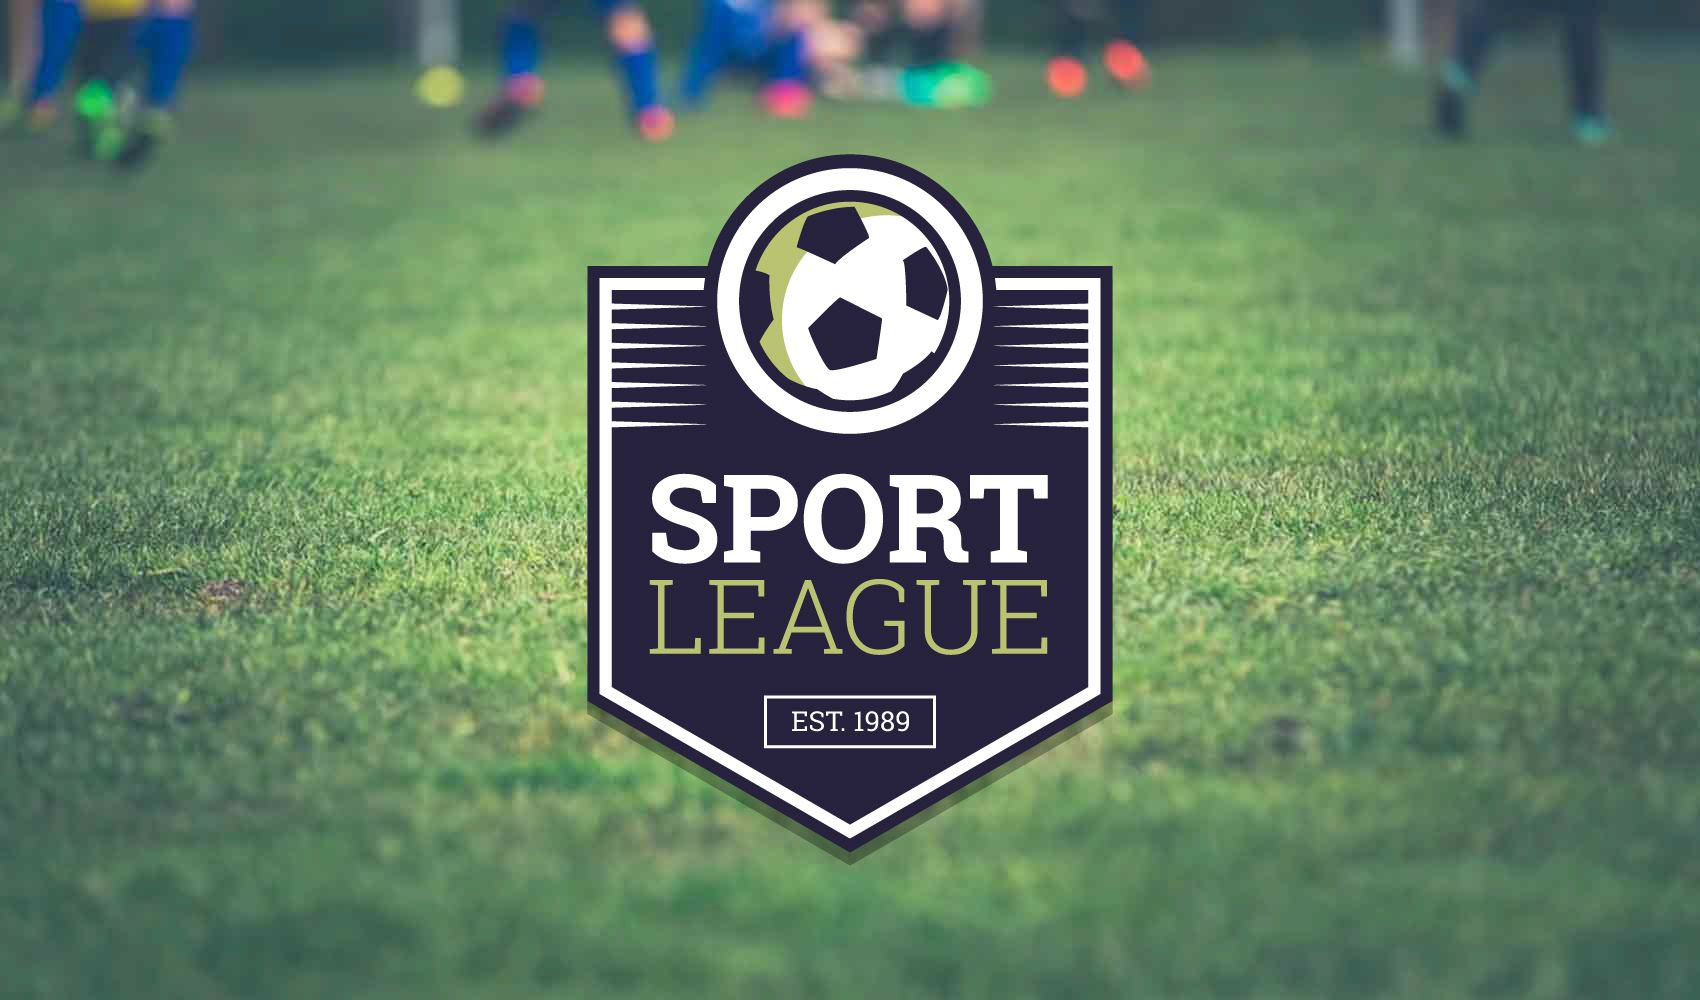 Soccer team logo label creator